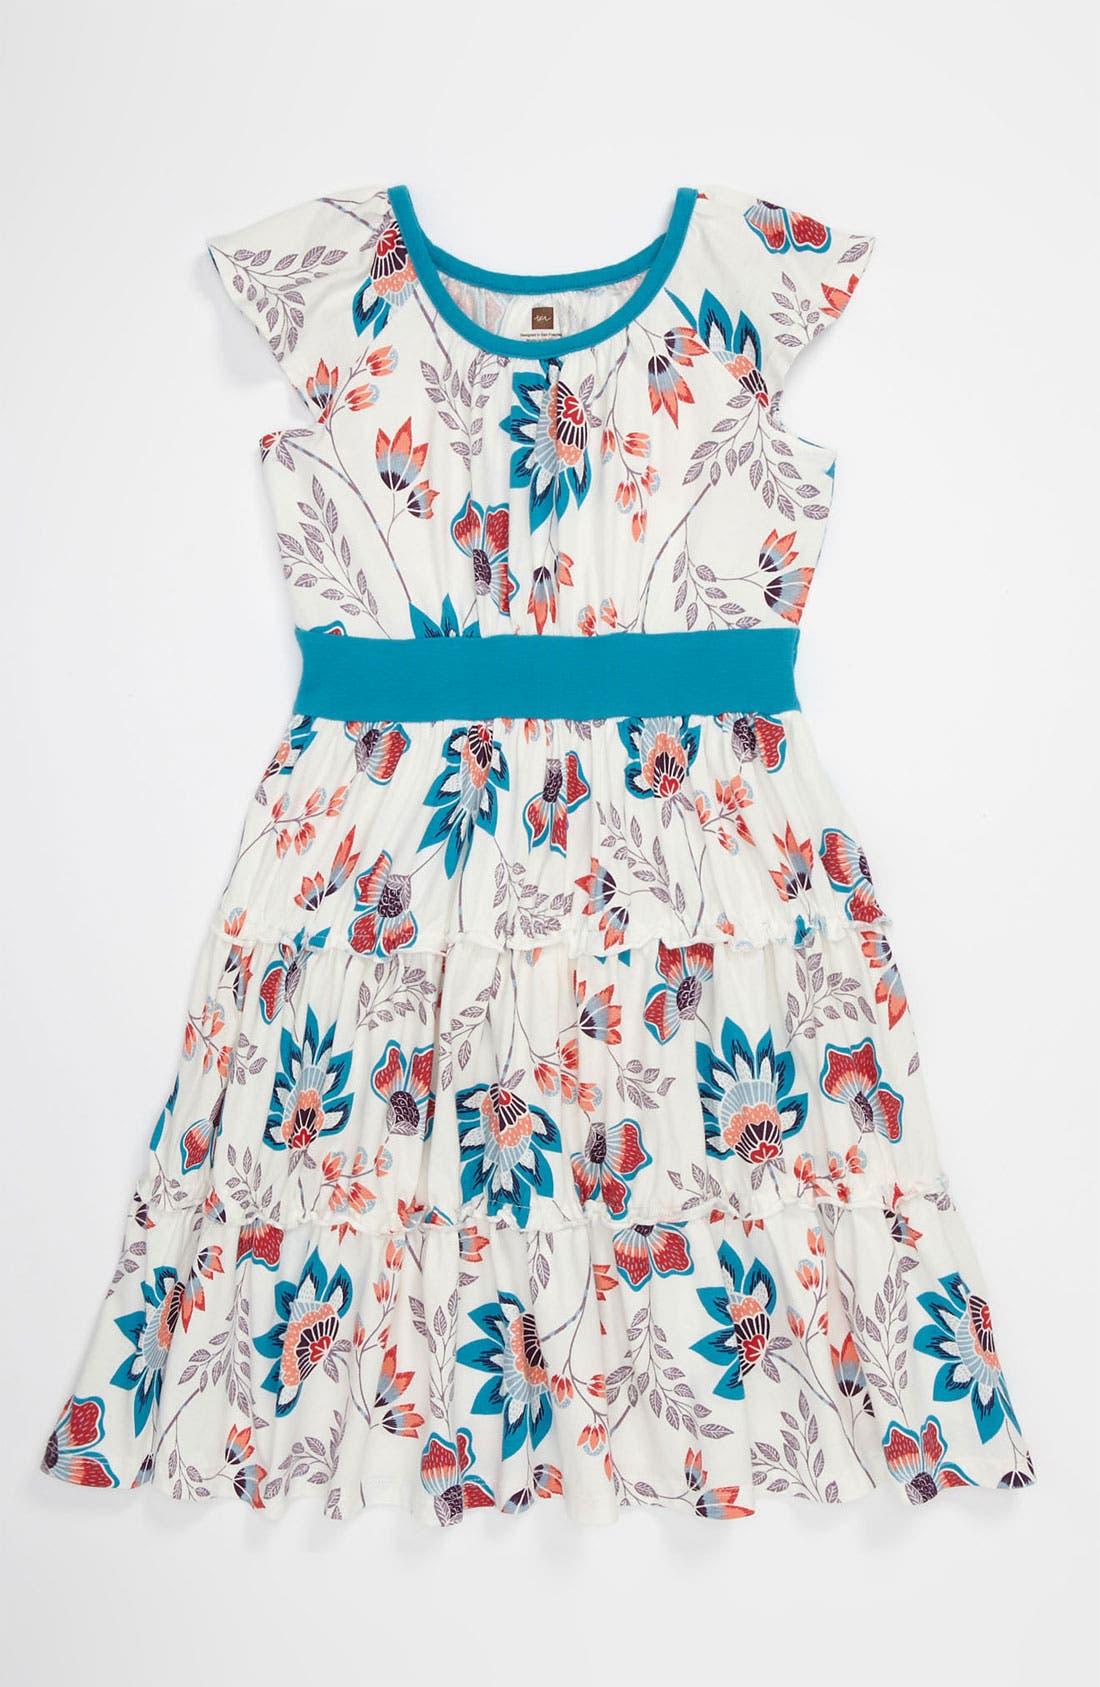 Main Image - Tea Collection 'Ardmore' Dress (Toddler, Little Girls & Big Girls)